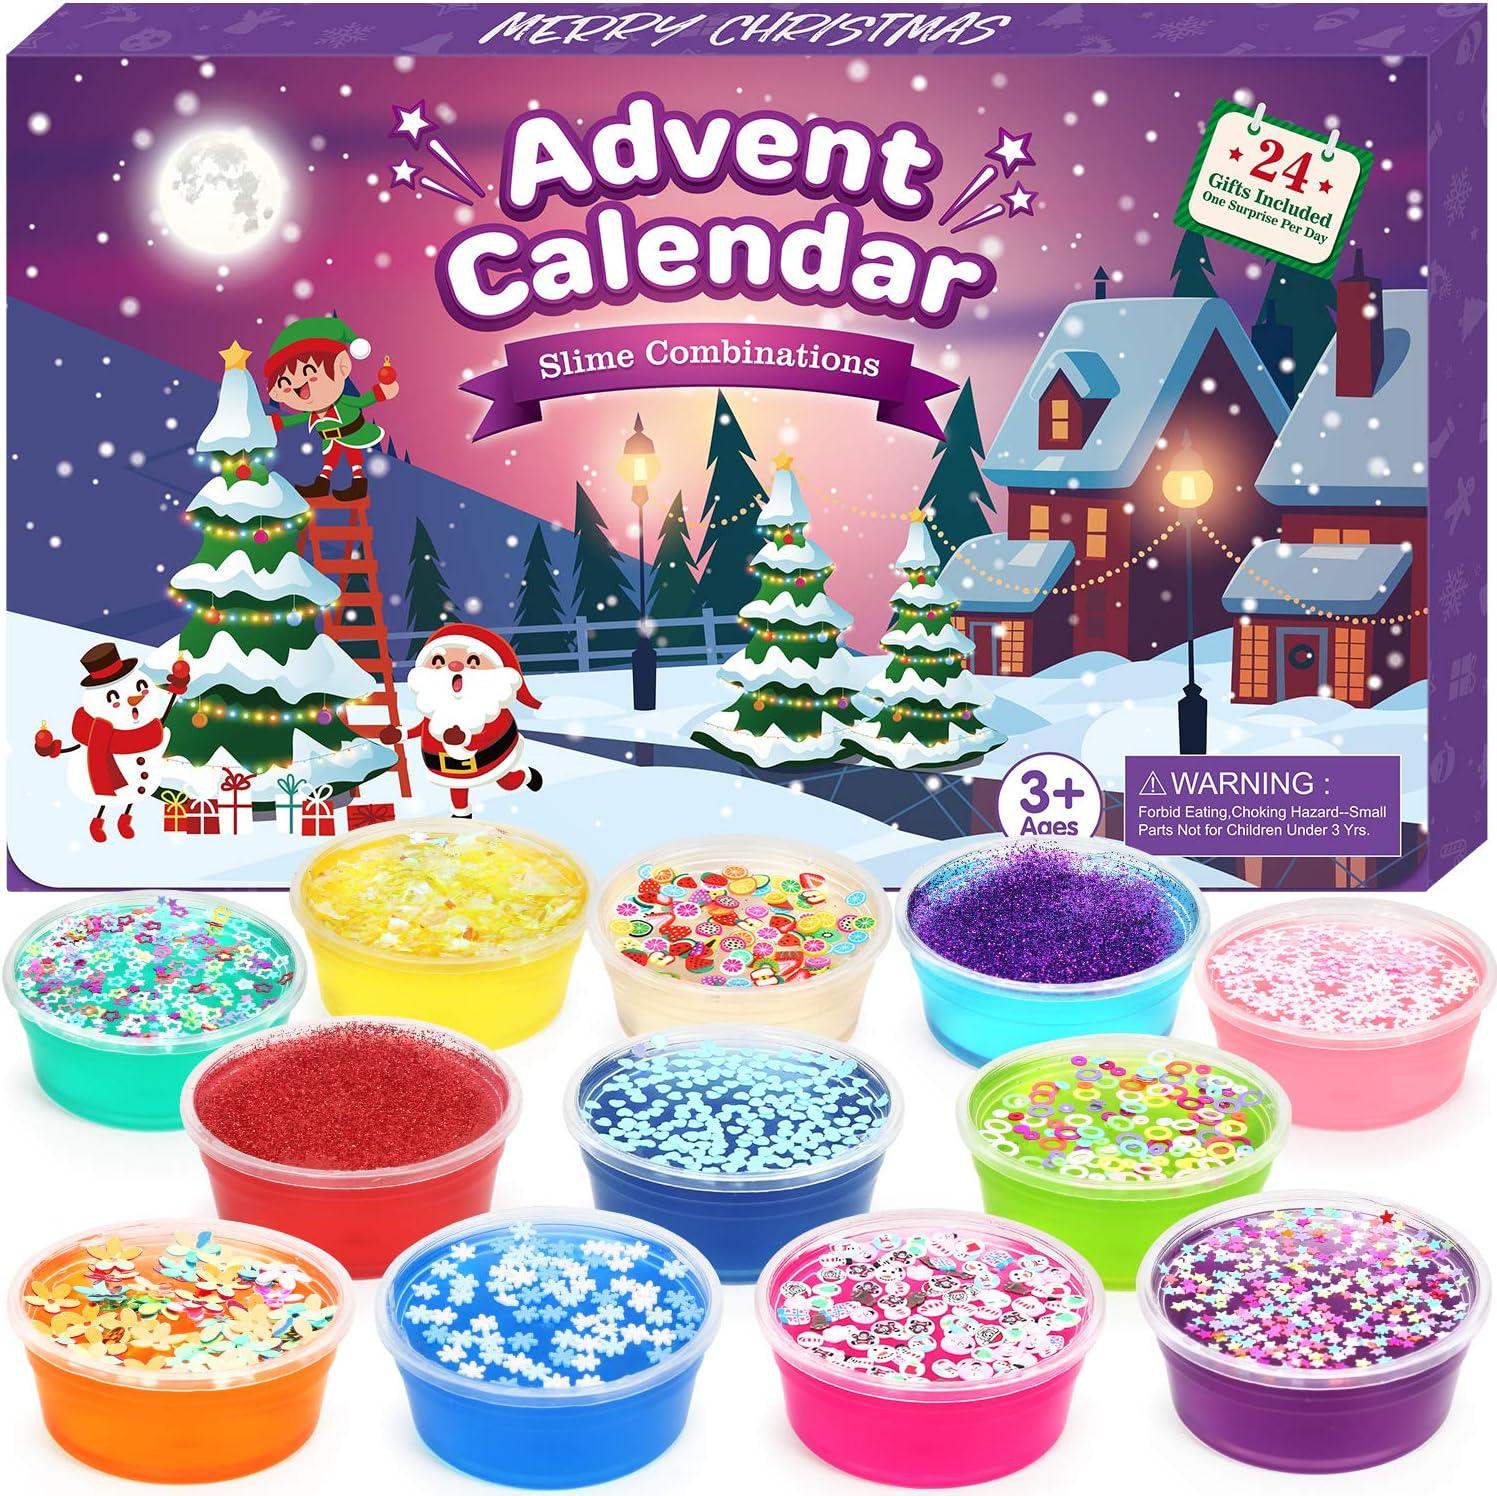 The Christmas Calendar 2020 Release Amazon.com: ELOVER Slime Advent Calendar 2020 for Girls Great